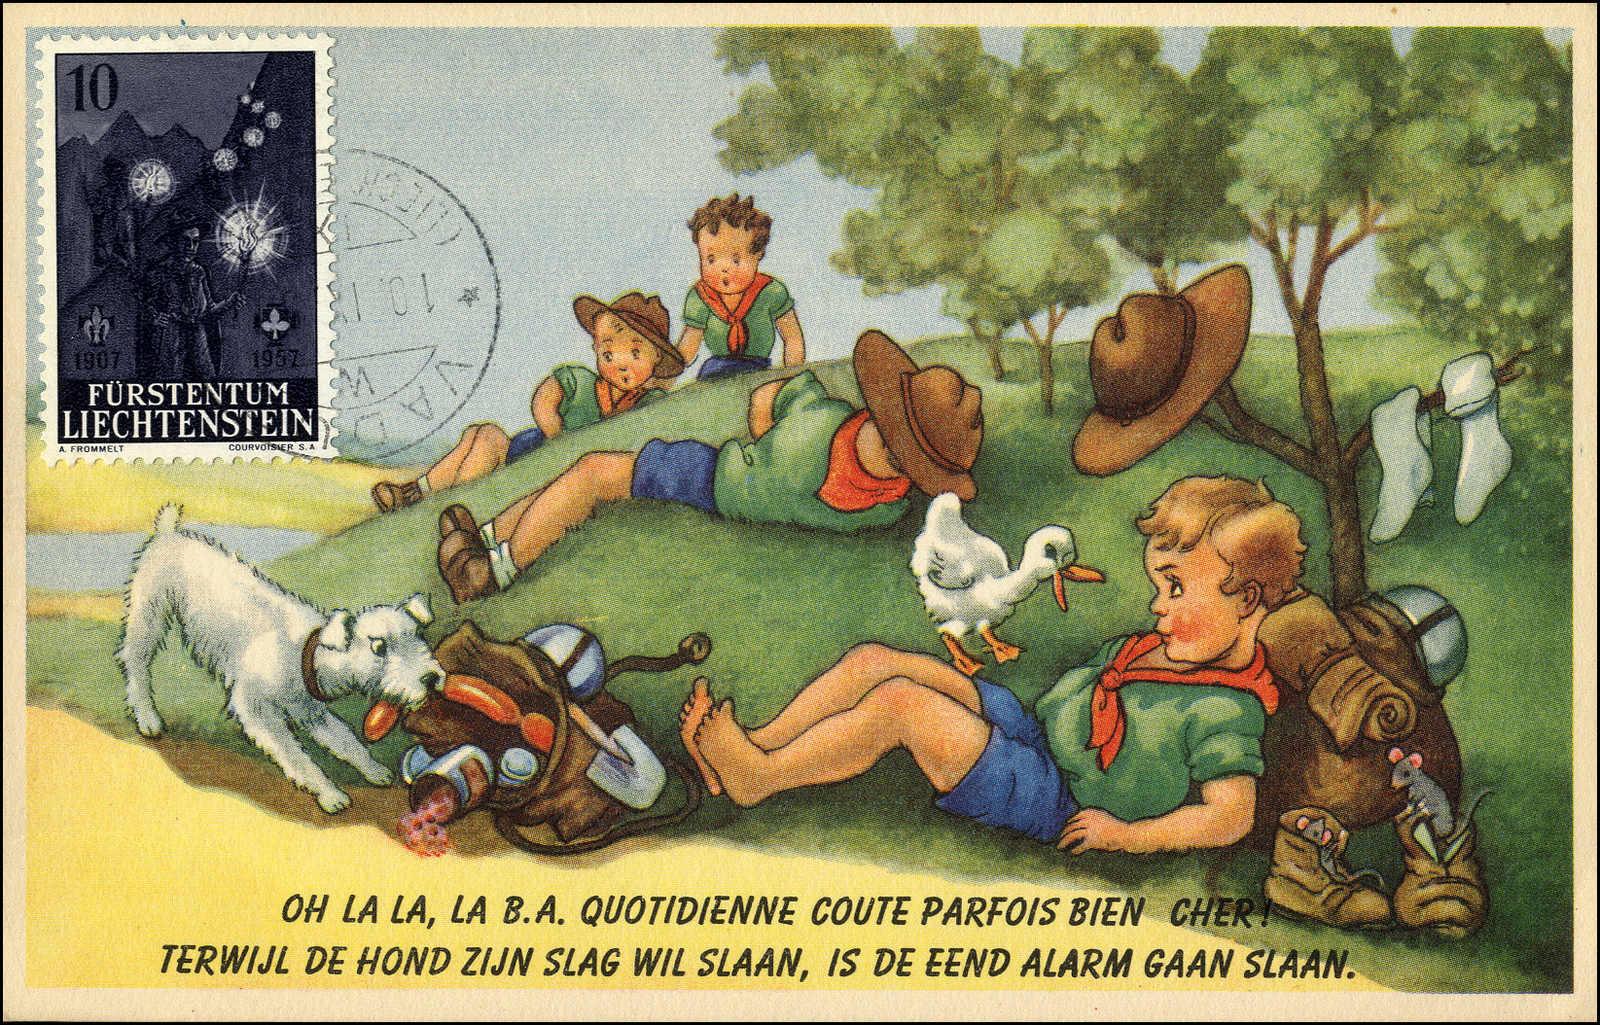 Lot 983 - europa Liechtenstein -  Rolli Auctions Auction #68 Day 1